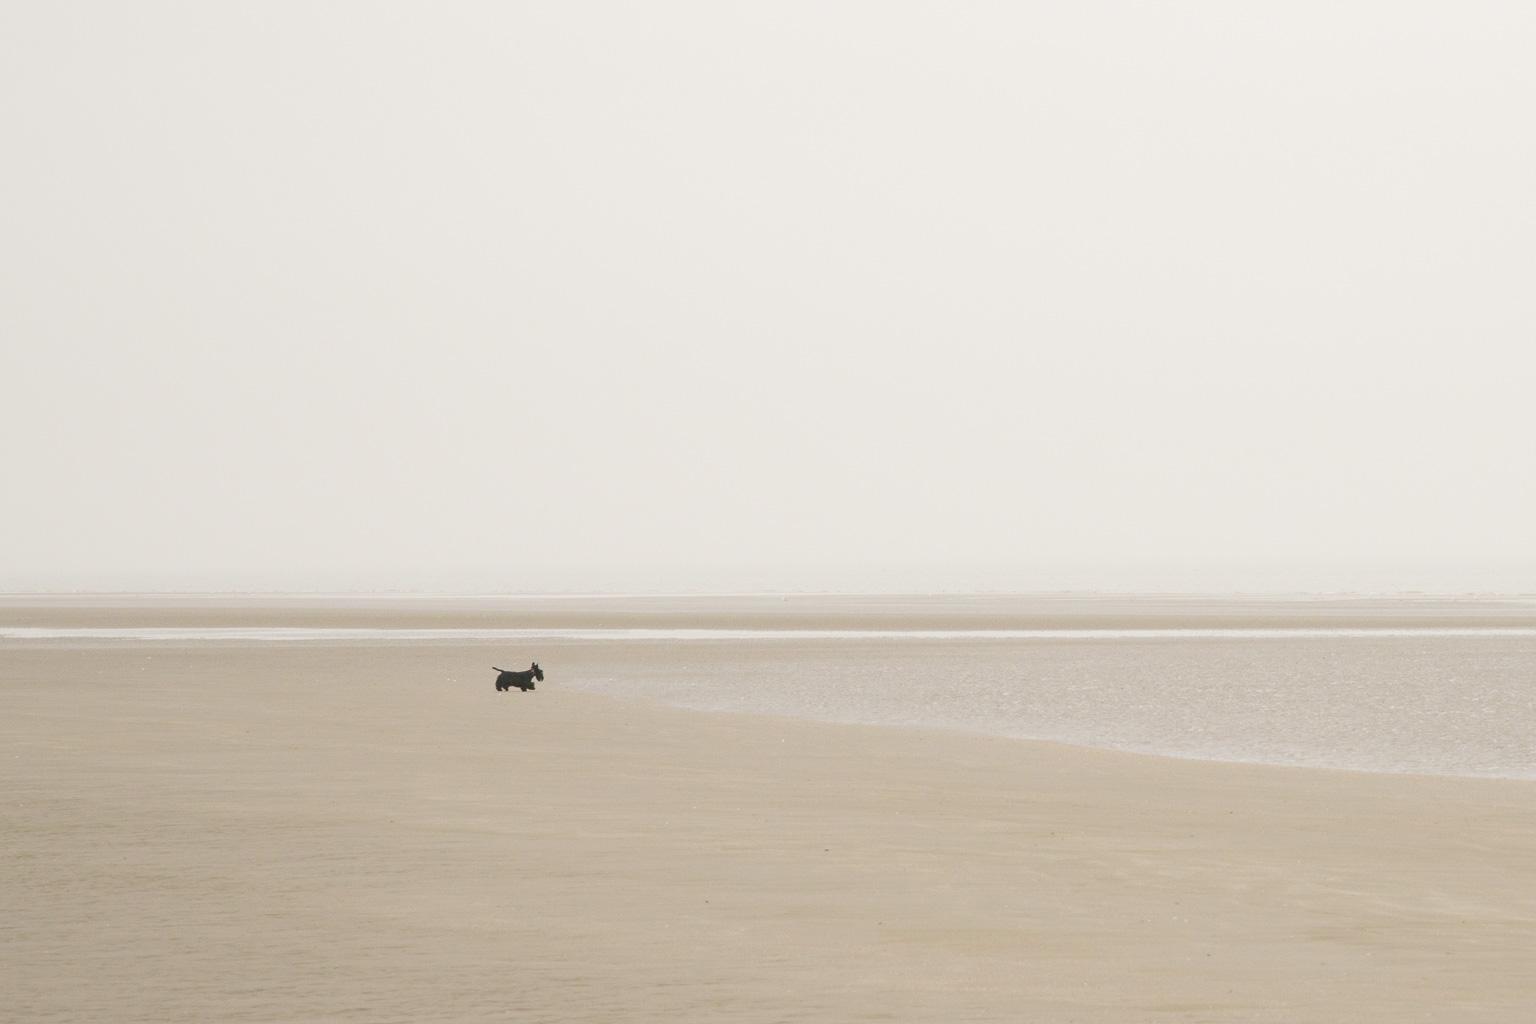 Earth & Sea by Florence Raskin